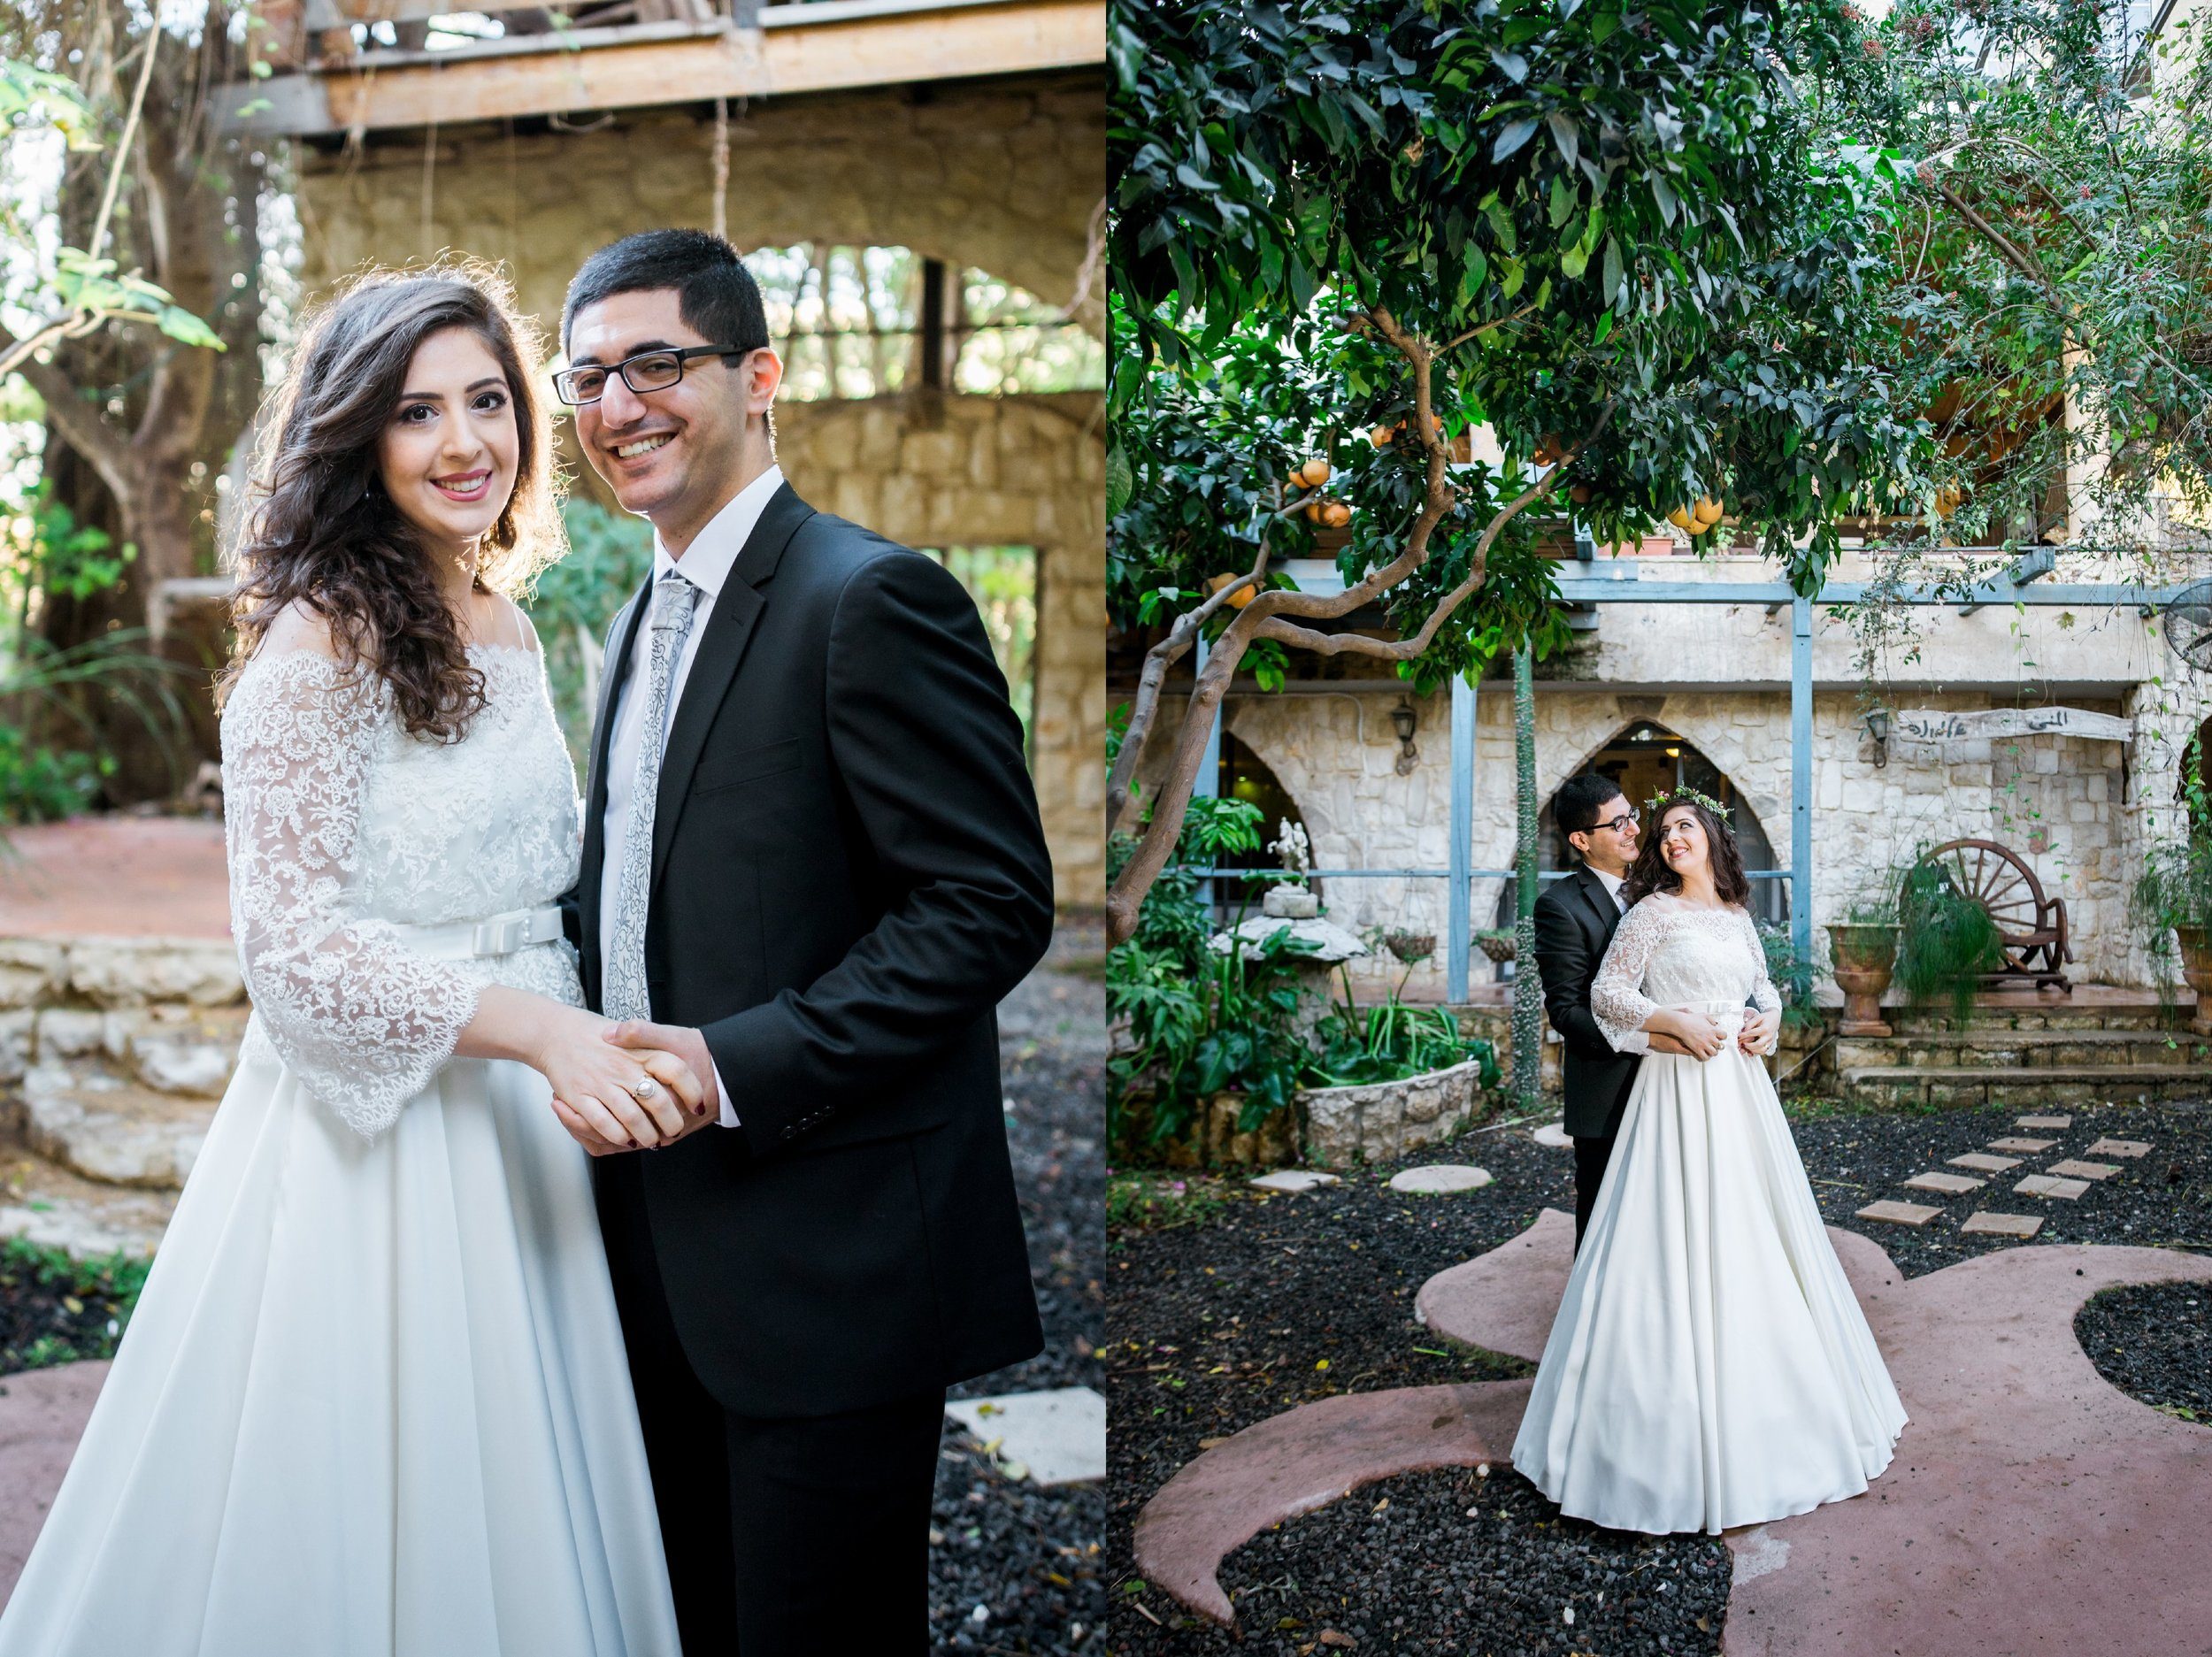 israel-garden-wedding-portraits-session-kate-giryes-photography--2_WEB.jpg